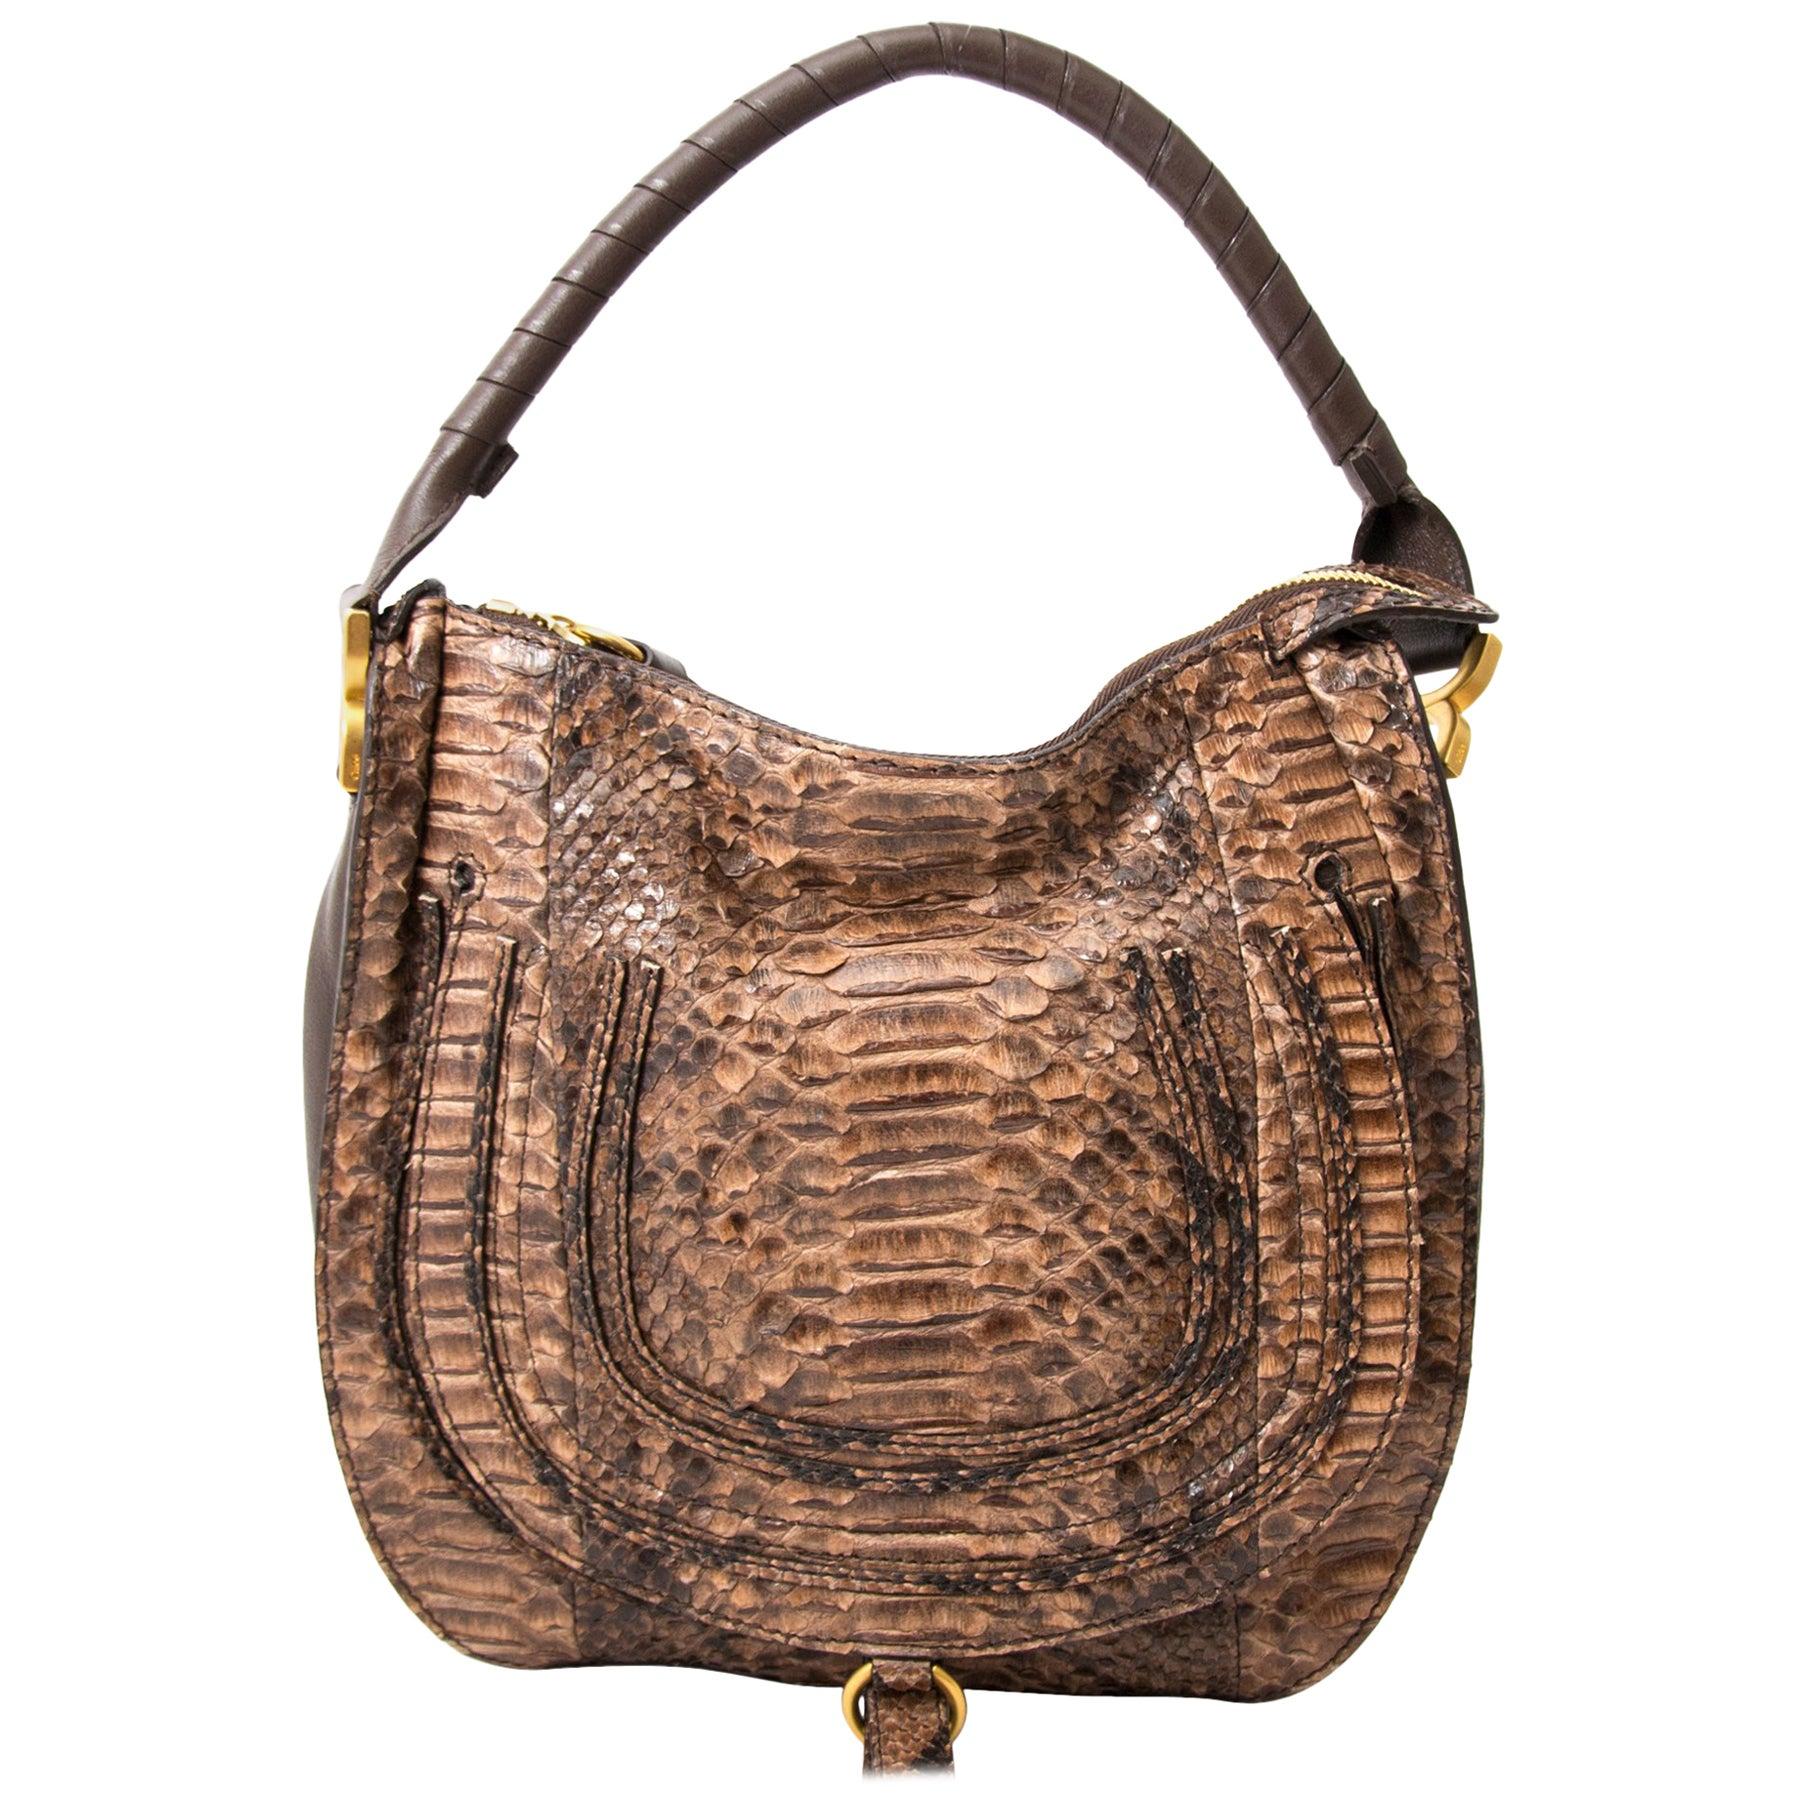 Chloé Python Marcie Satchel Bag